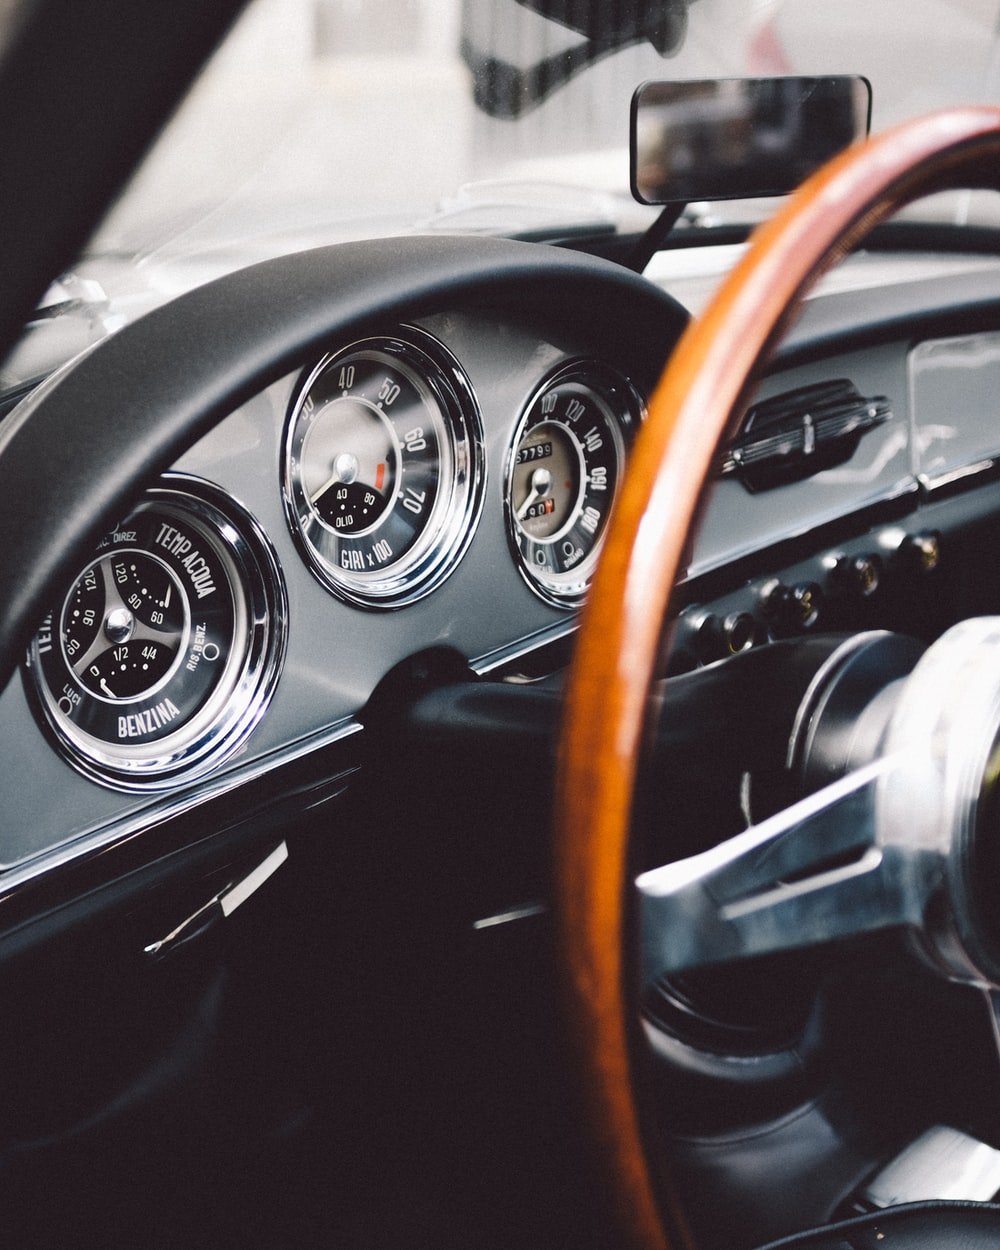 focus photography of vehicle steering wheel